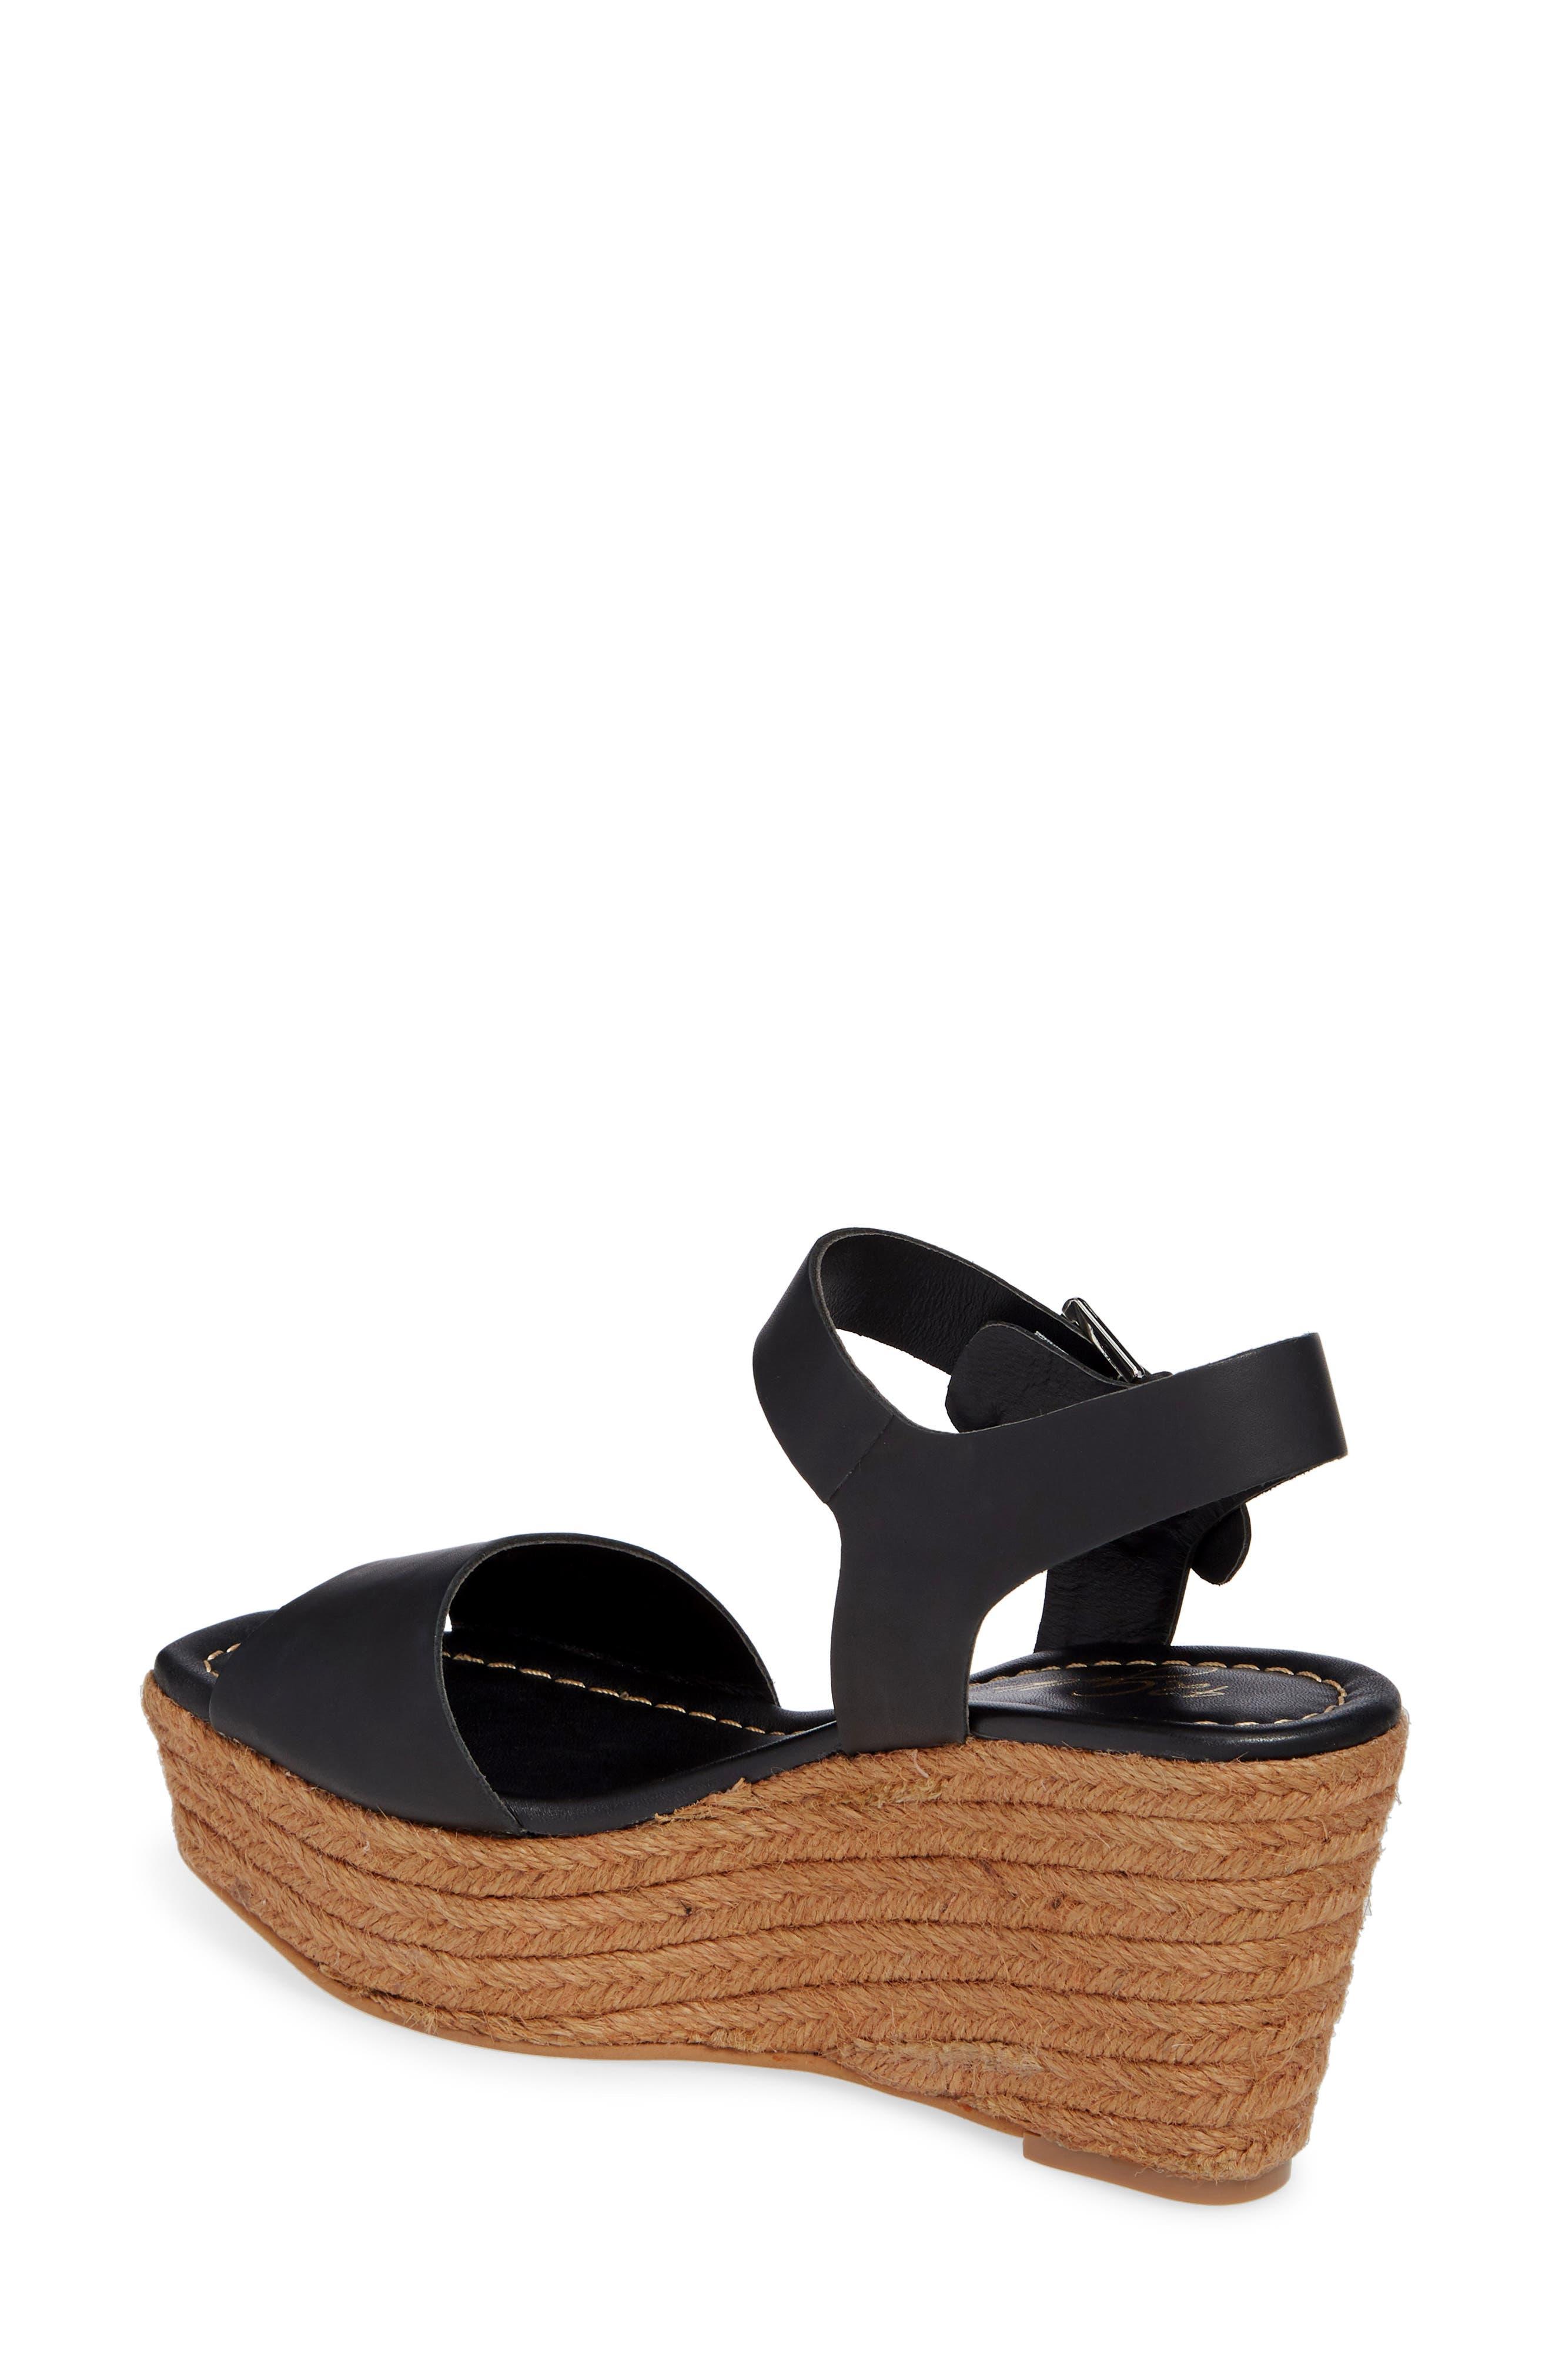 42 GOLD, Maine Platform Wedge Sandal, Alternate thumbnail 2, color, BLACK LEATHER